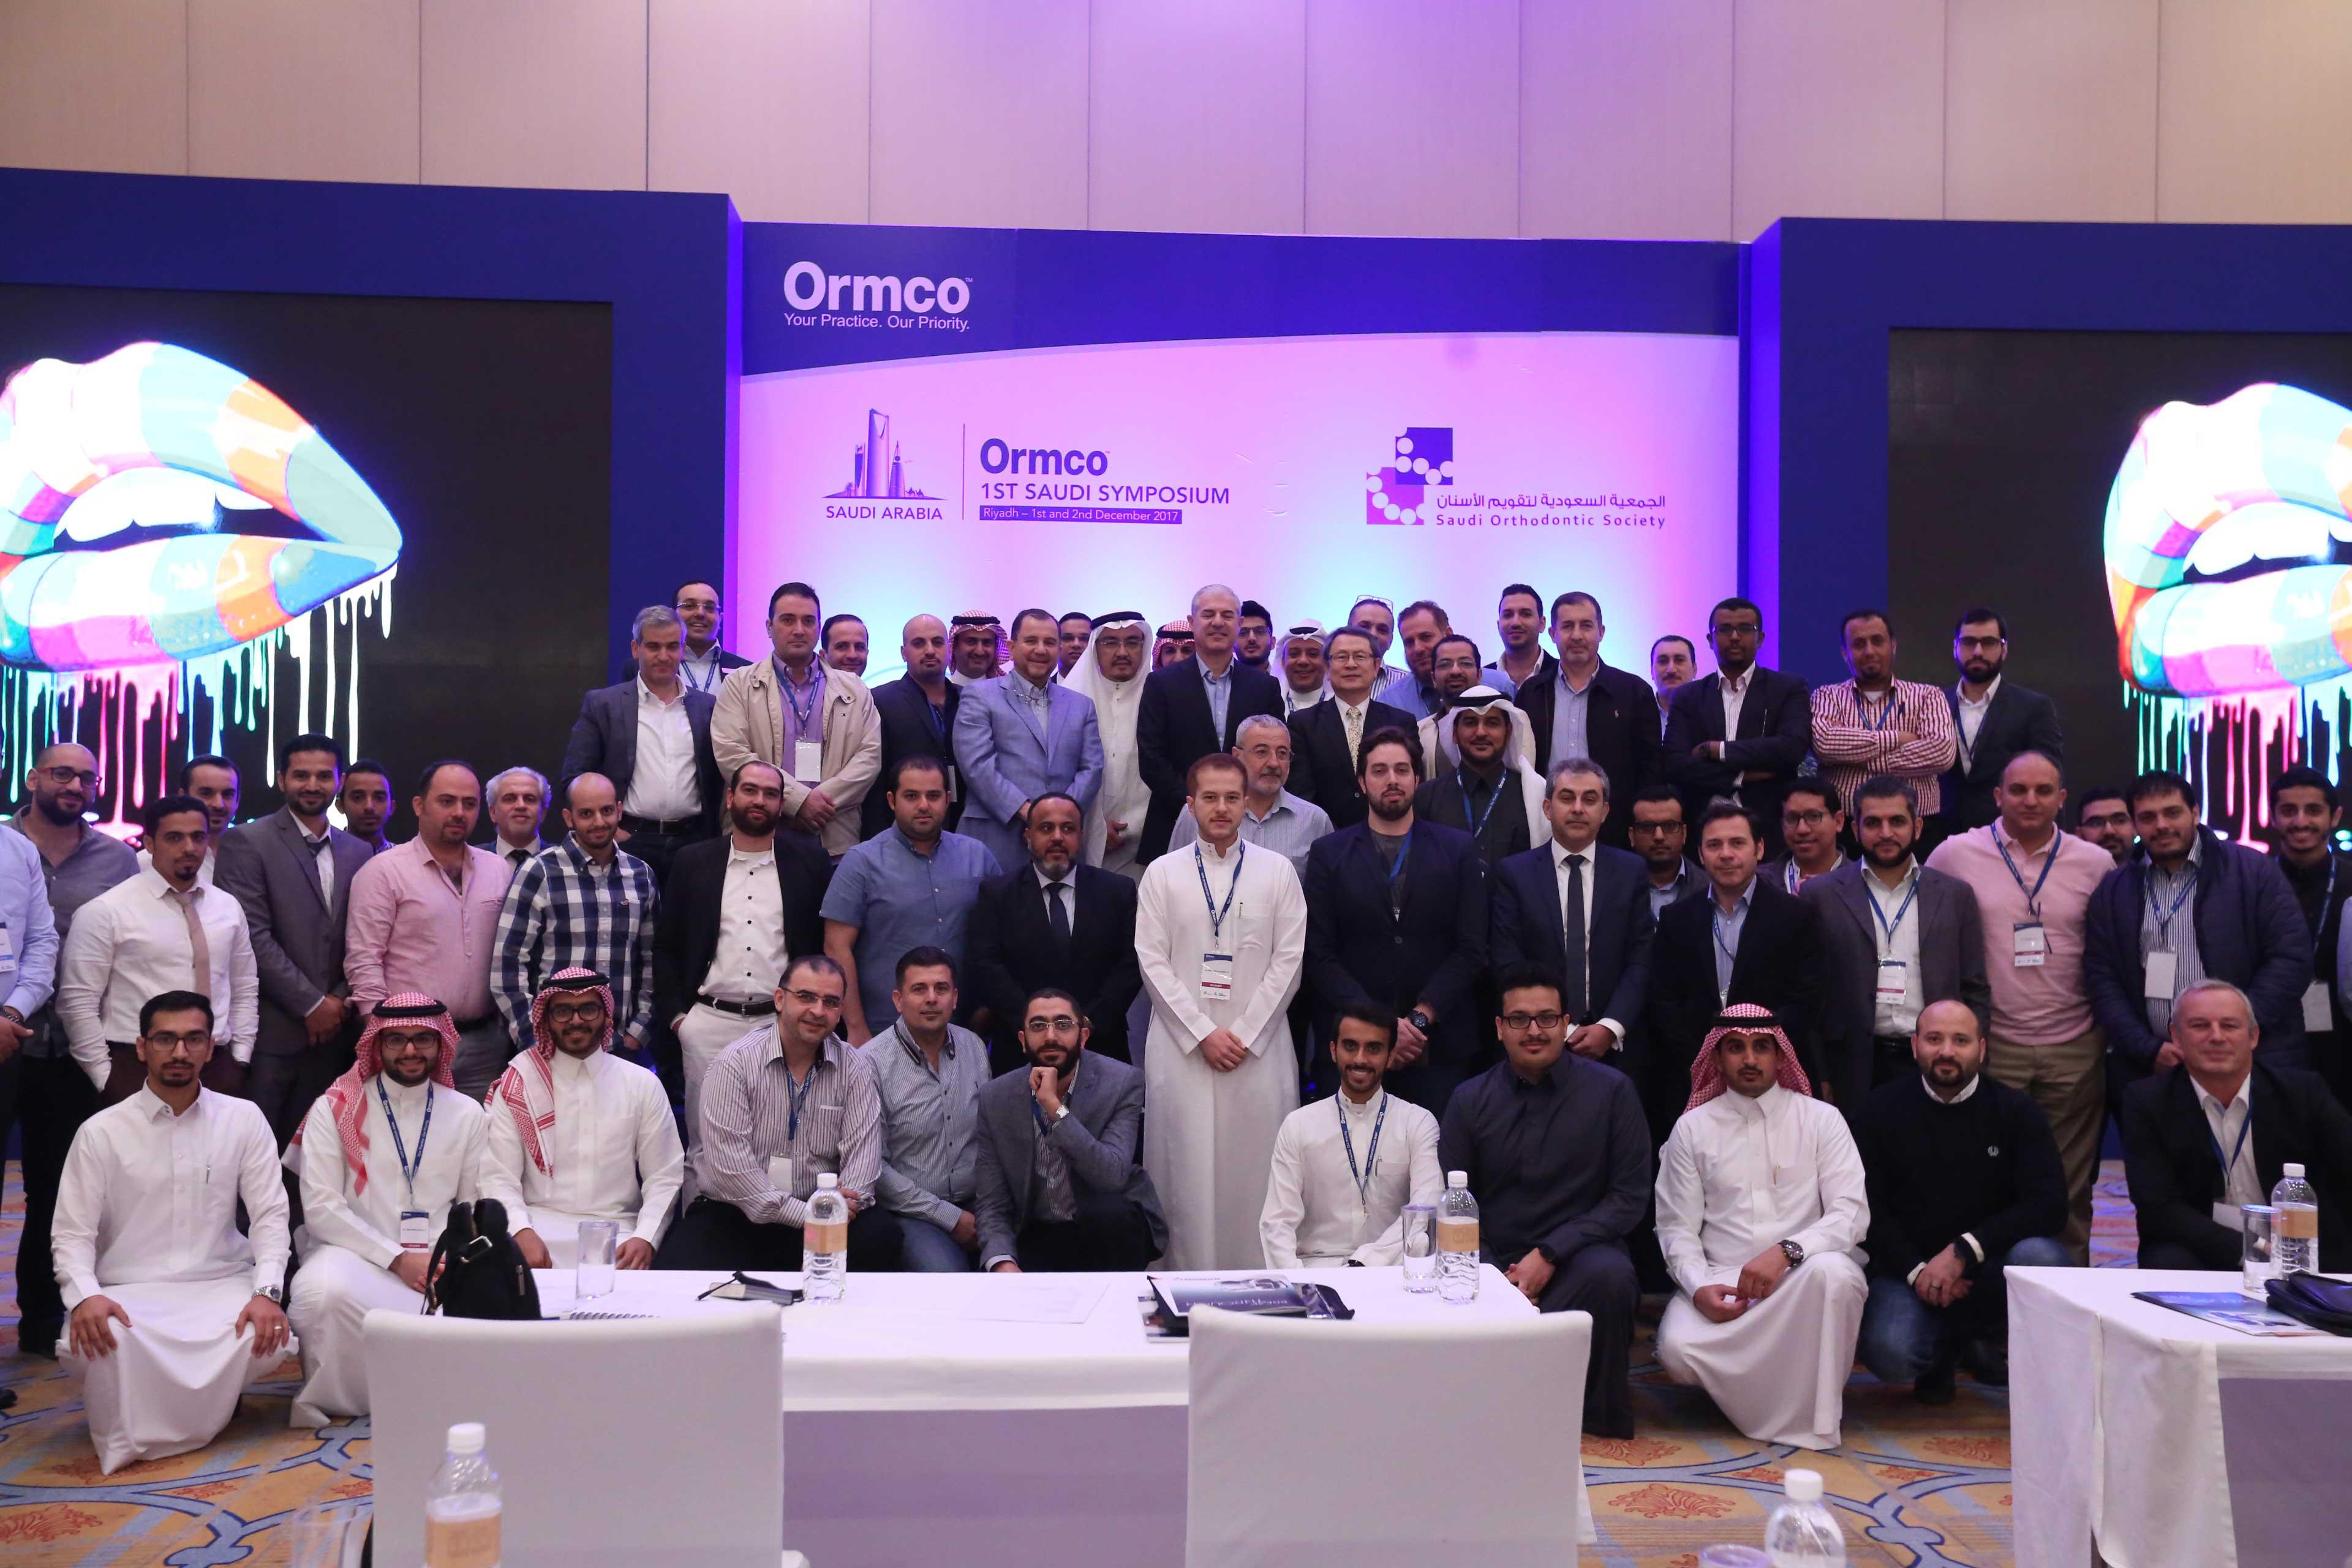 Ormco 1st Symposium In Saudi Arabia Dental News